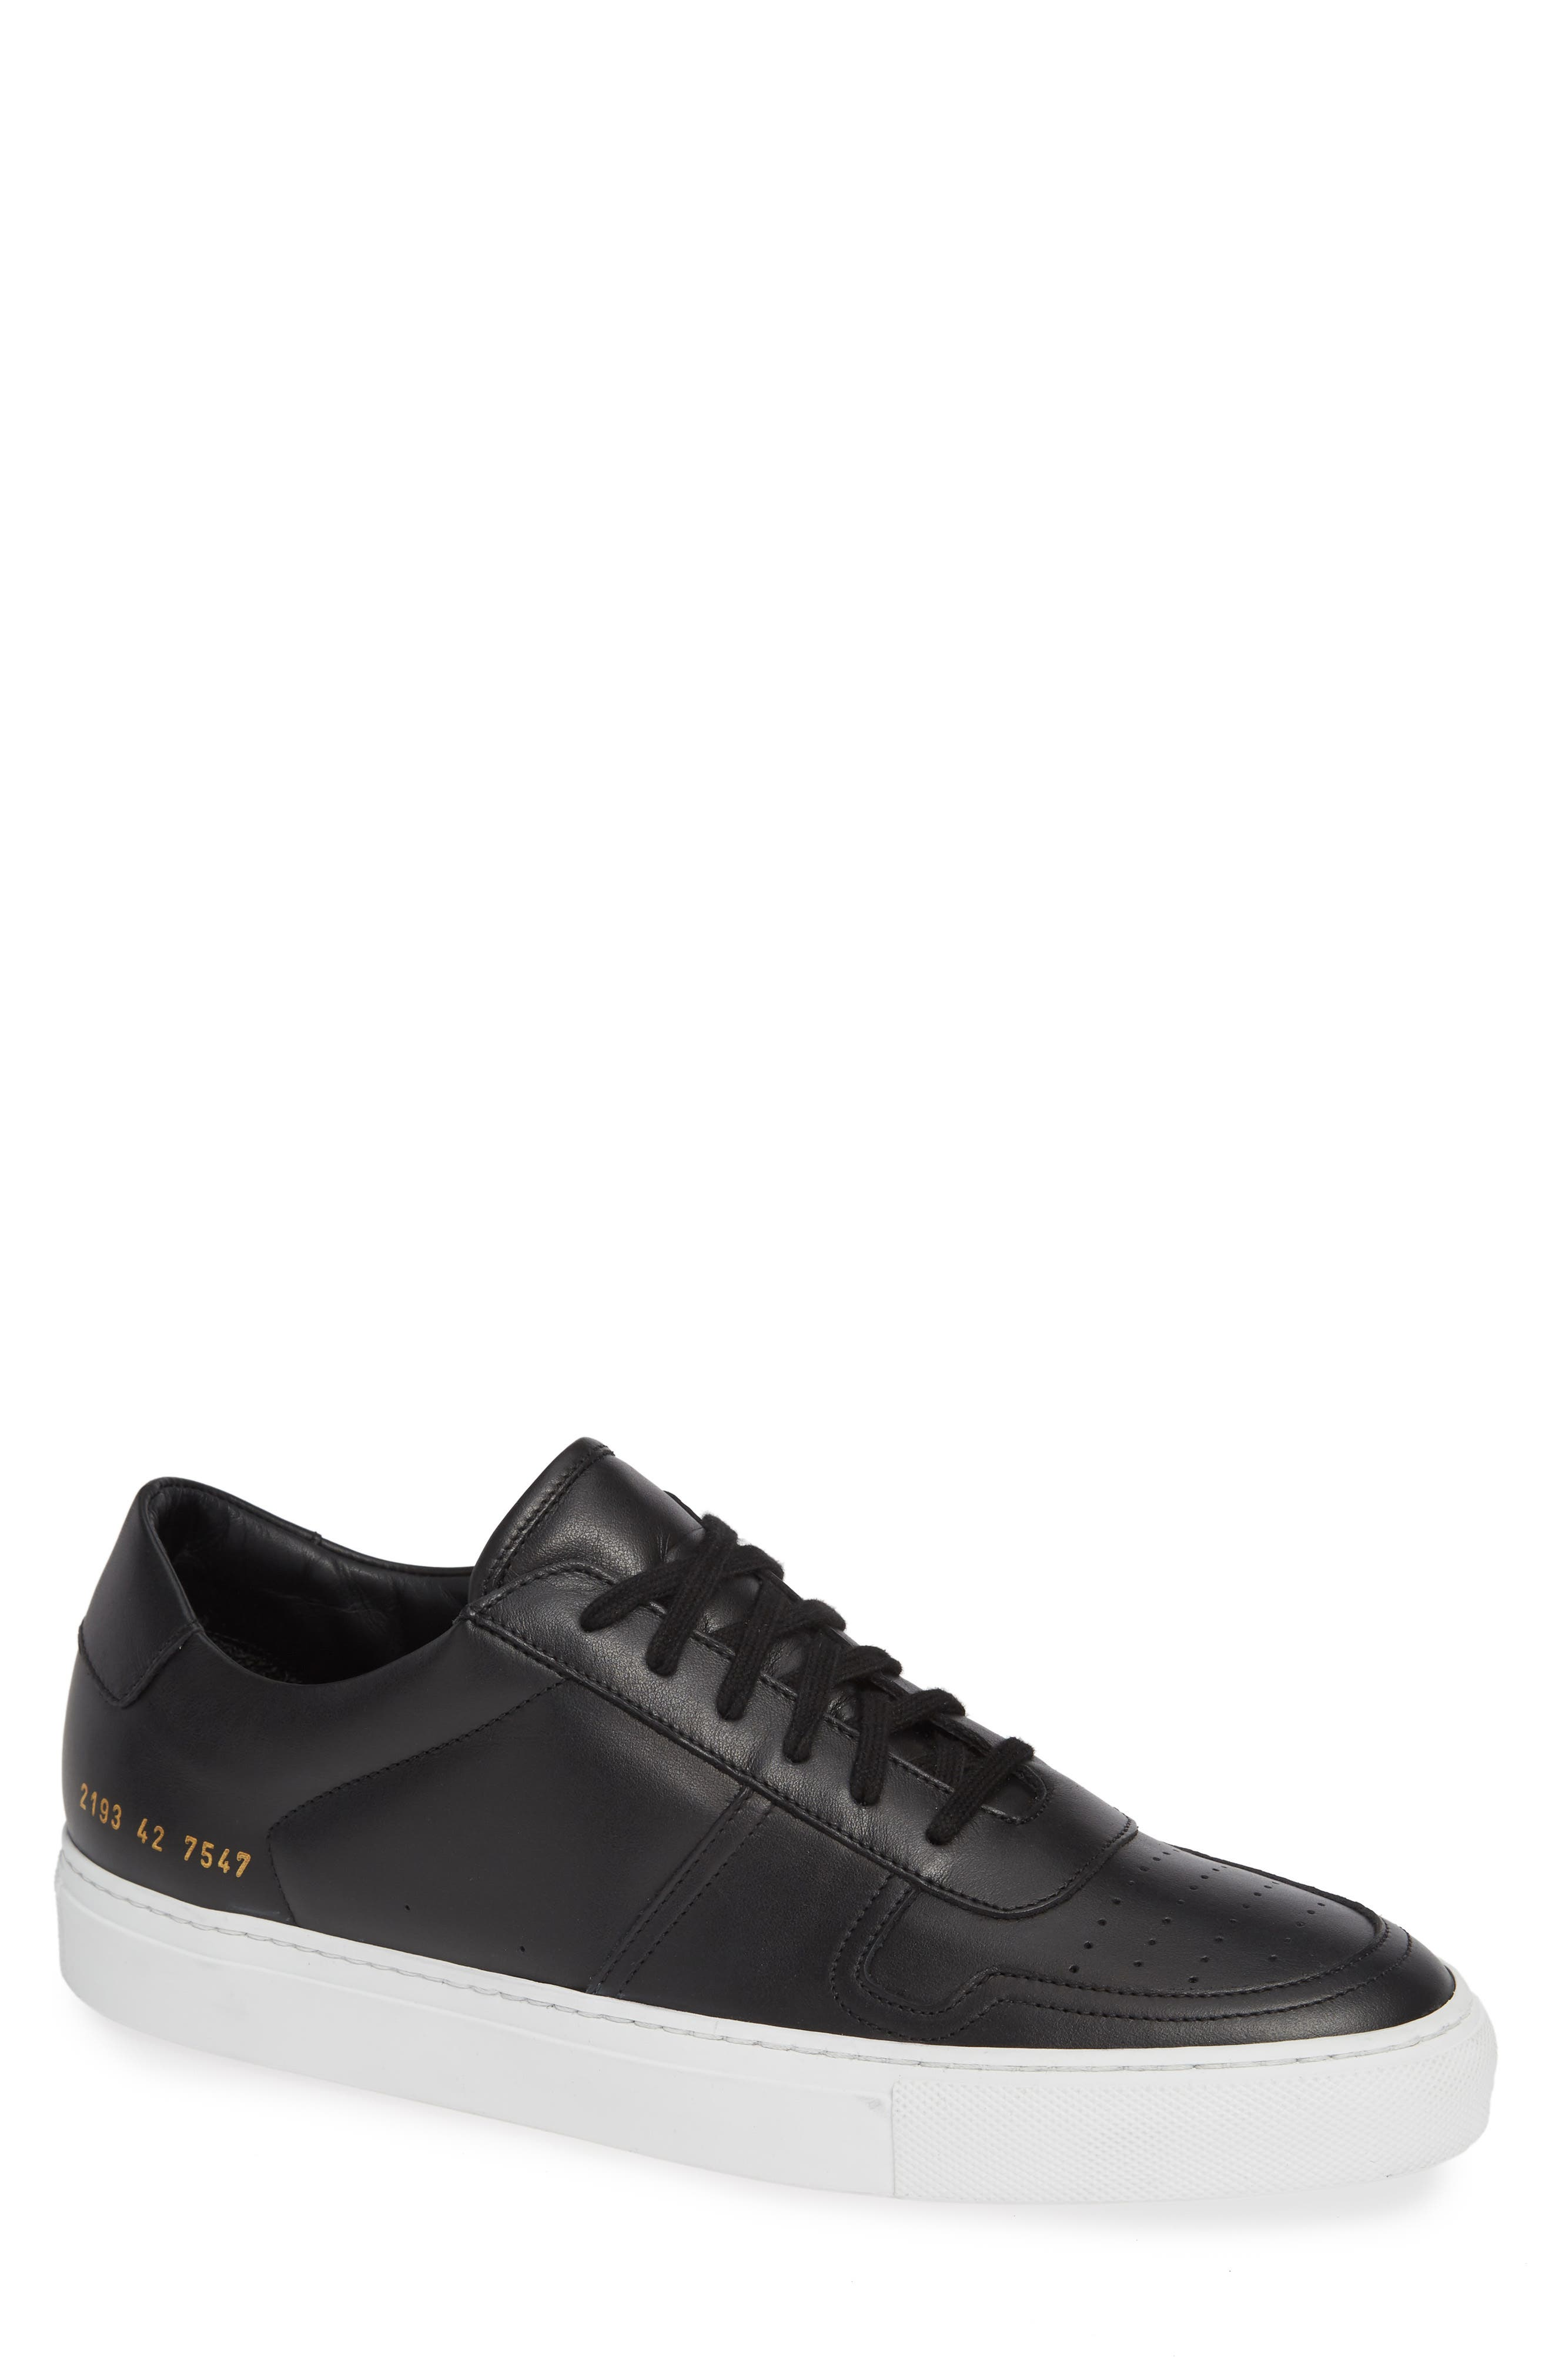 Bball Low Top Sneaker,                         Main,                         color, BLACK